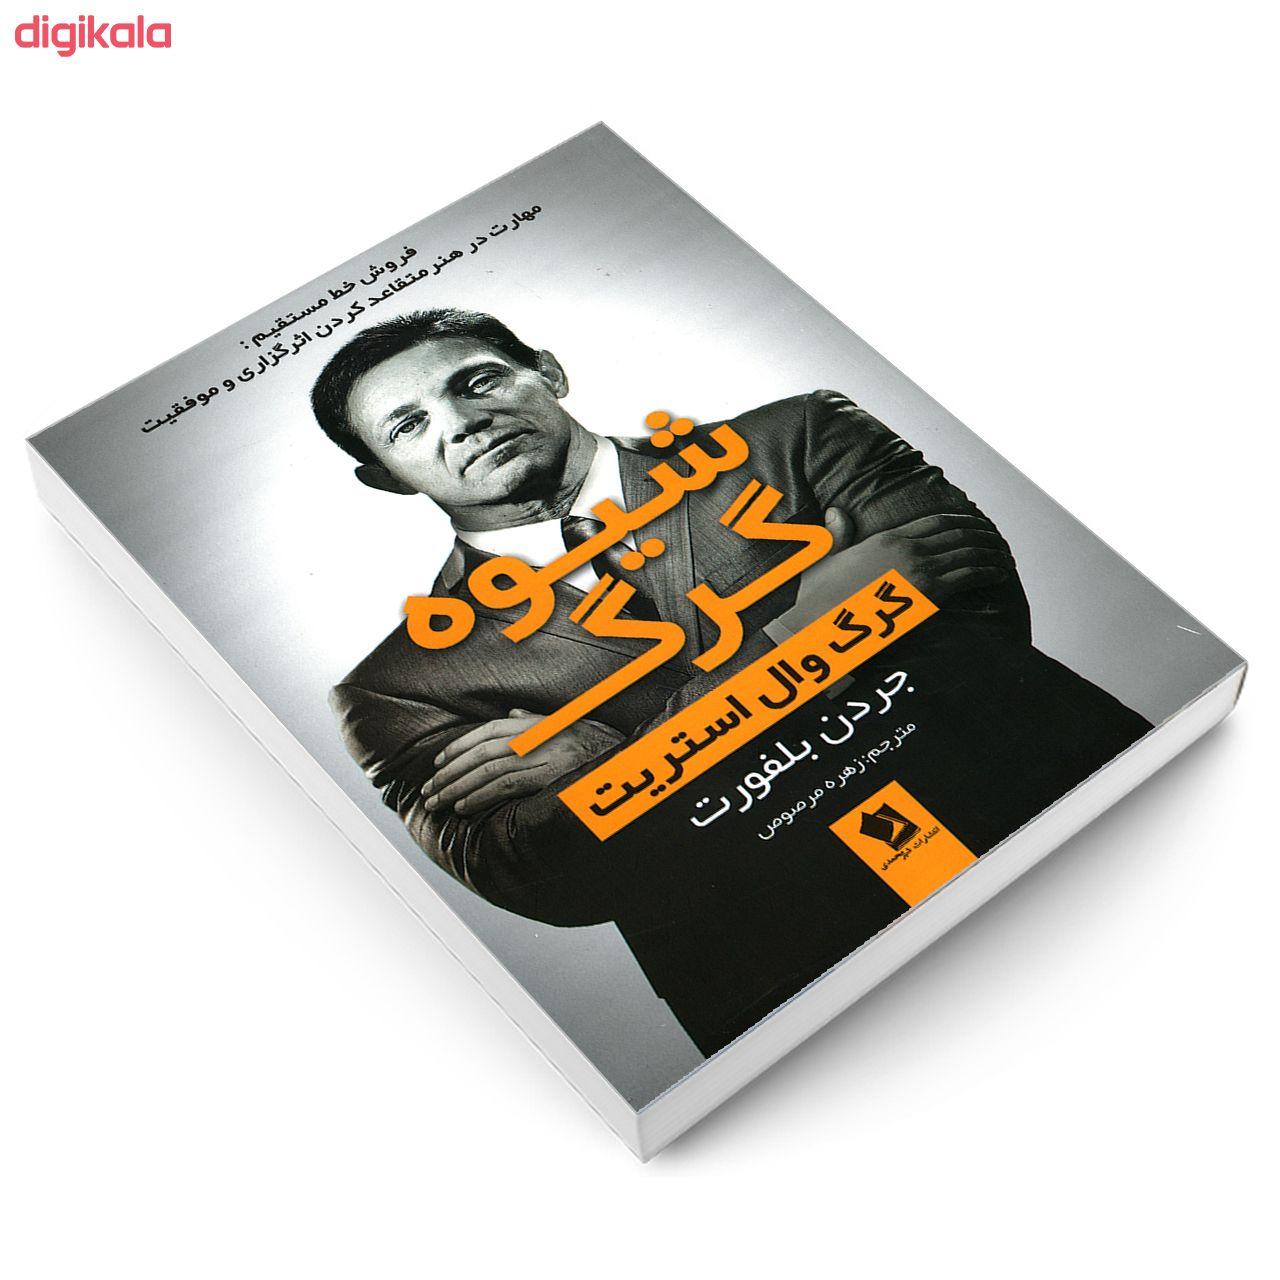 کتاب شیوه گرگ اثر جردن بلفورت انتشارات  شیرمحمدی main 1 2